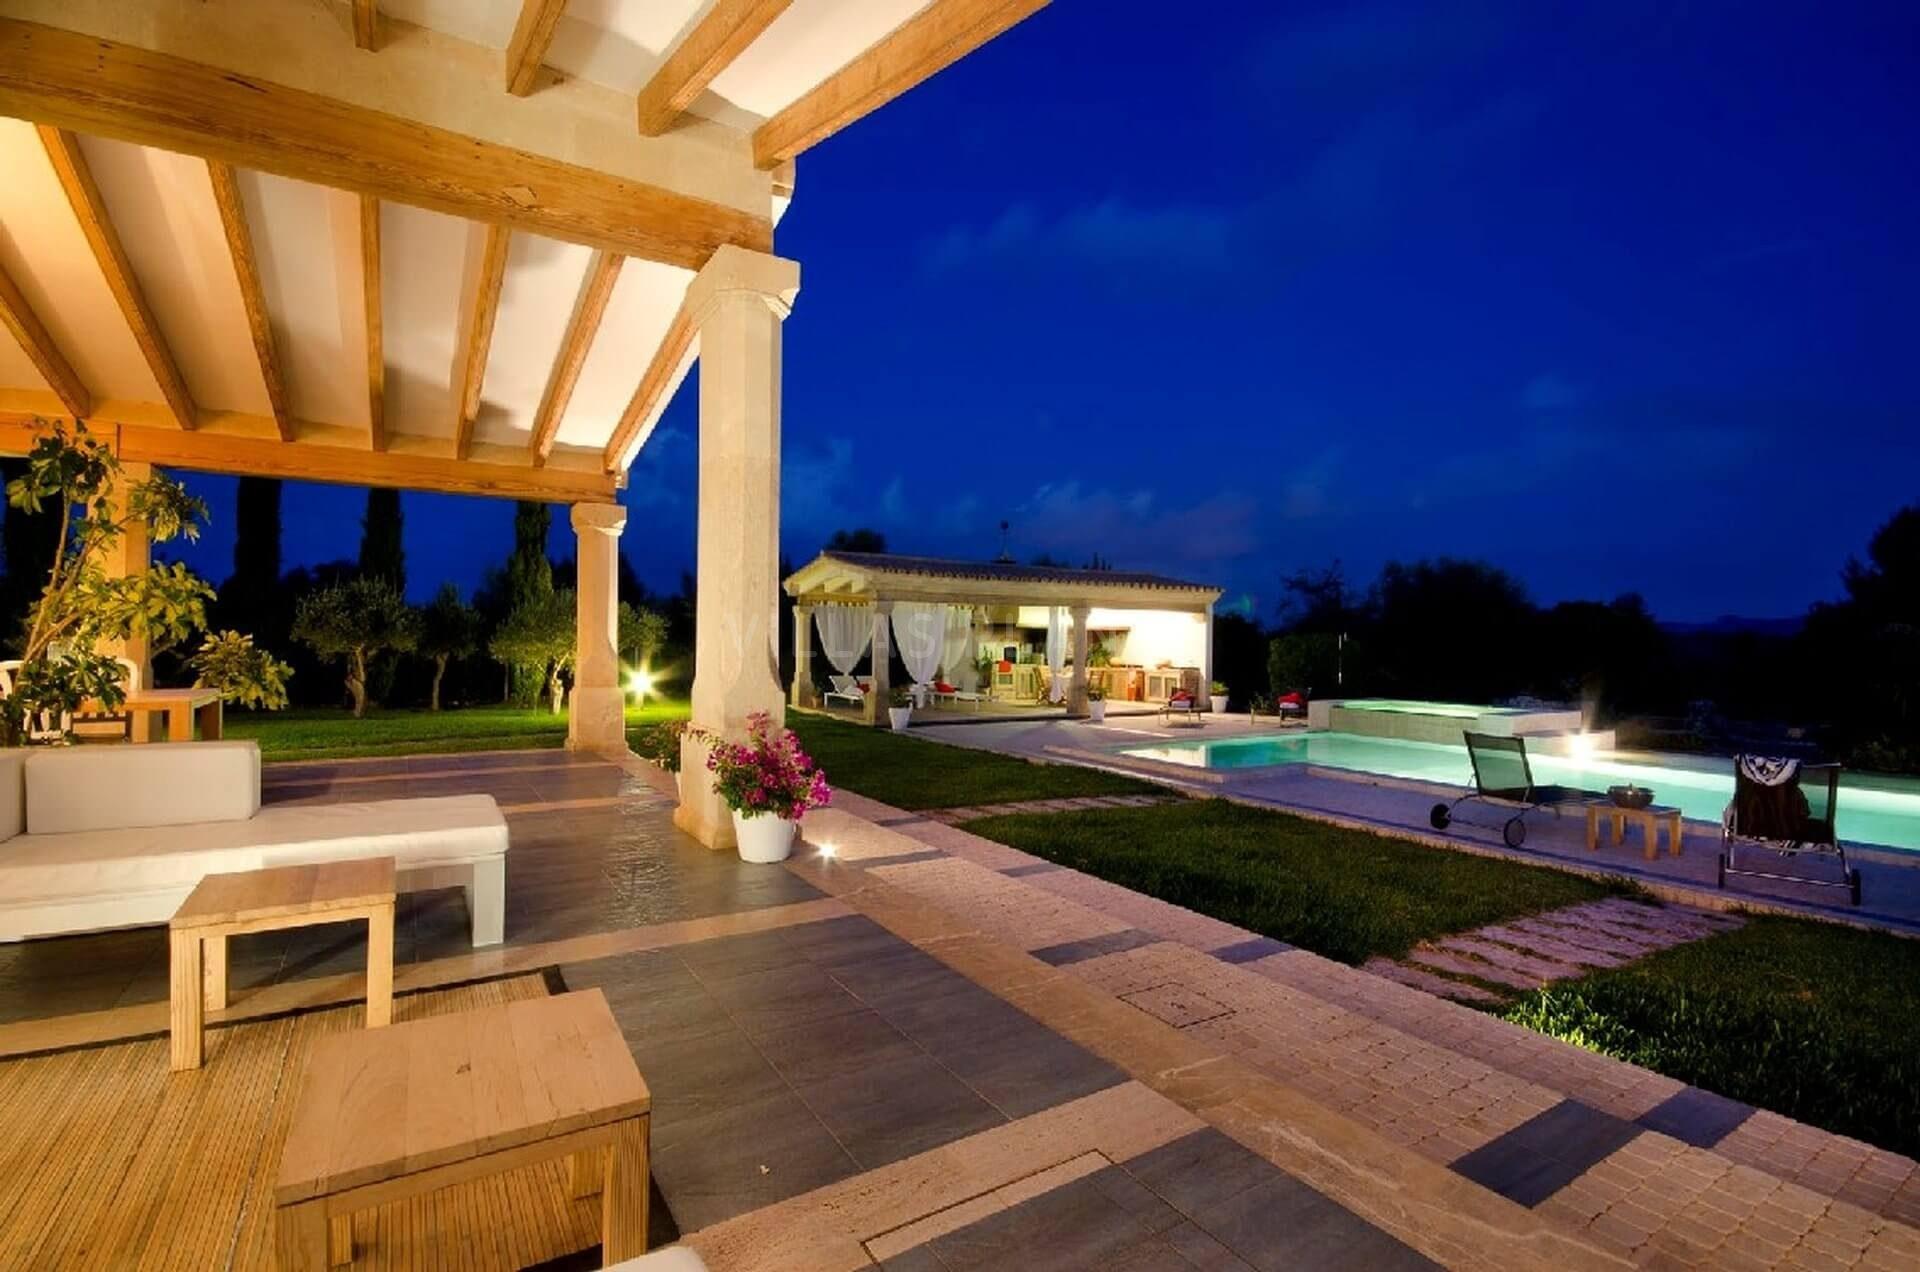 jardines rusticos con piscina jardines rusticos con piscina with jardines rusticos con piscina. Black Bedroom Furniture Sets. Home Design Ideas